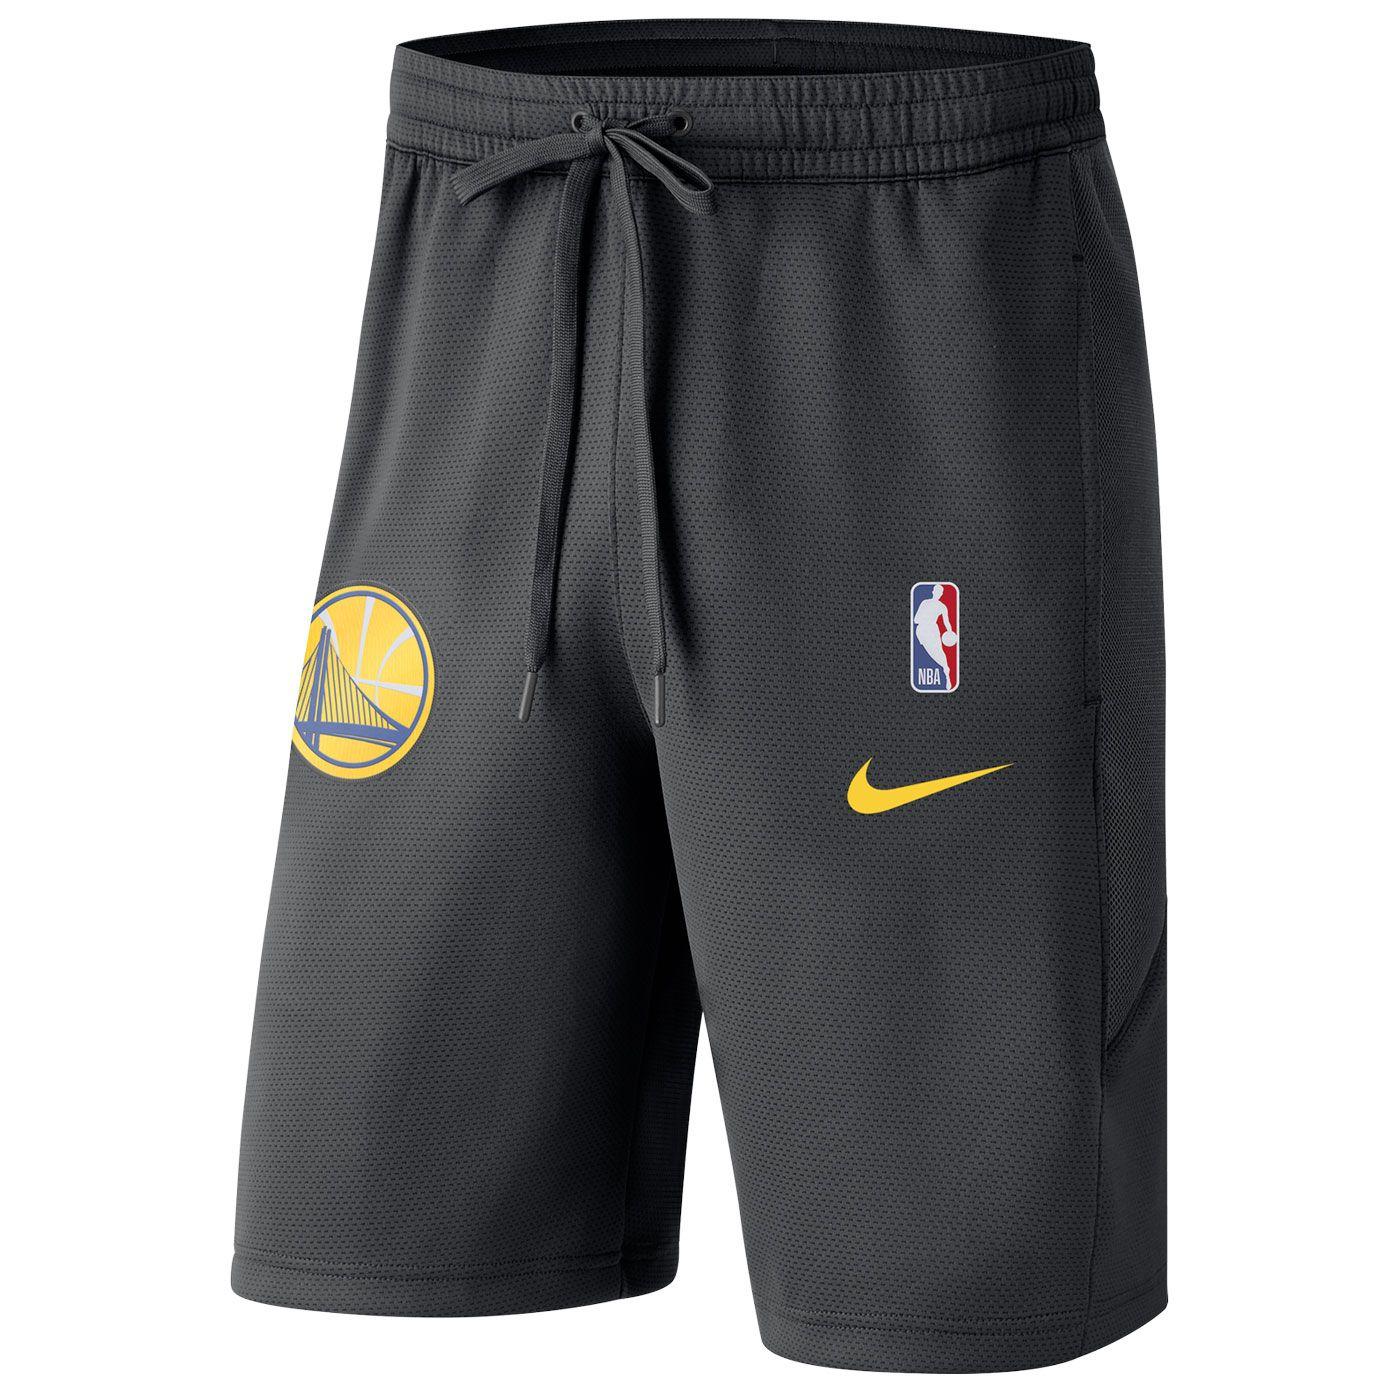 40c2b014499 Nike Dri-FIT 2019 NBA All-Star Edition Men s Jordan Swingman Shorts ...